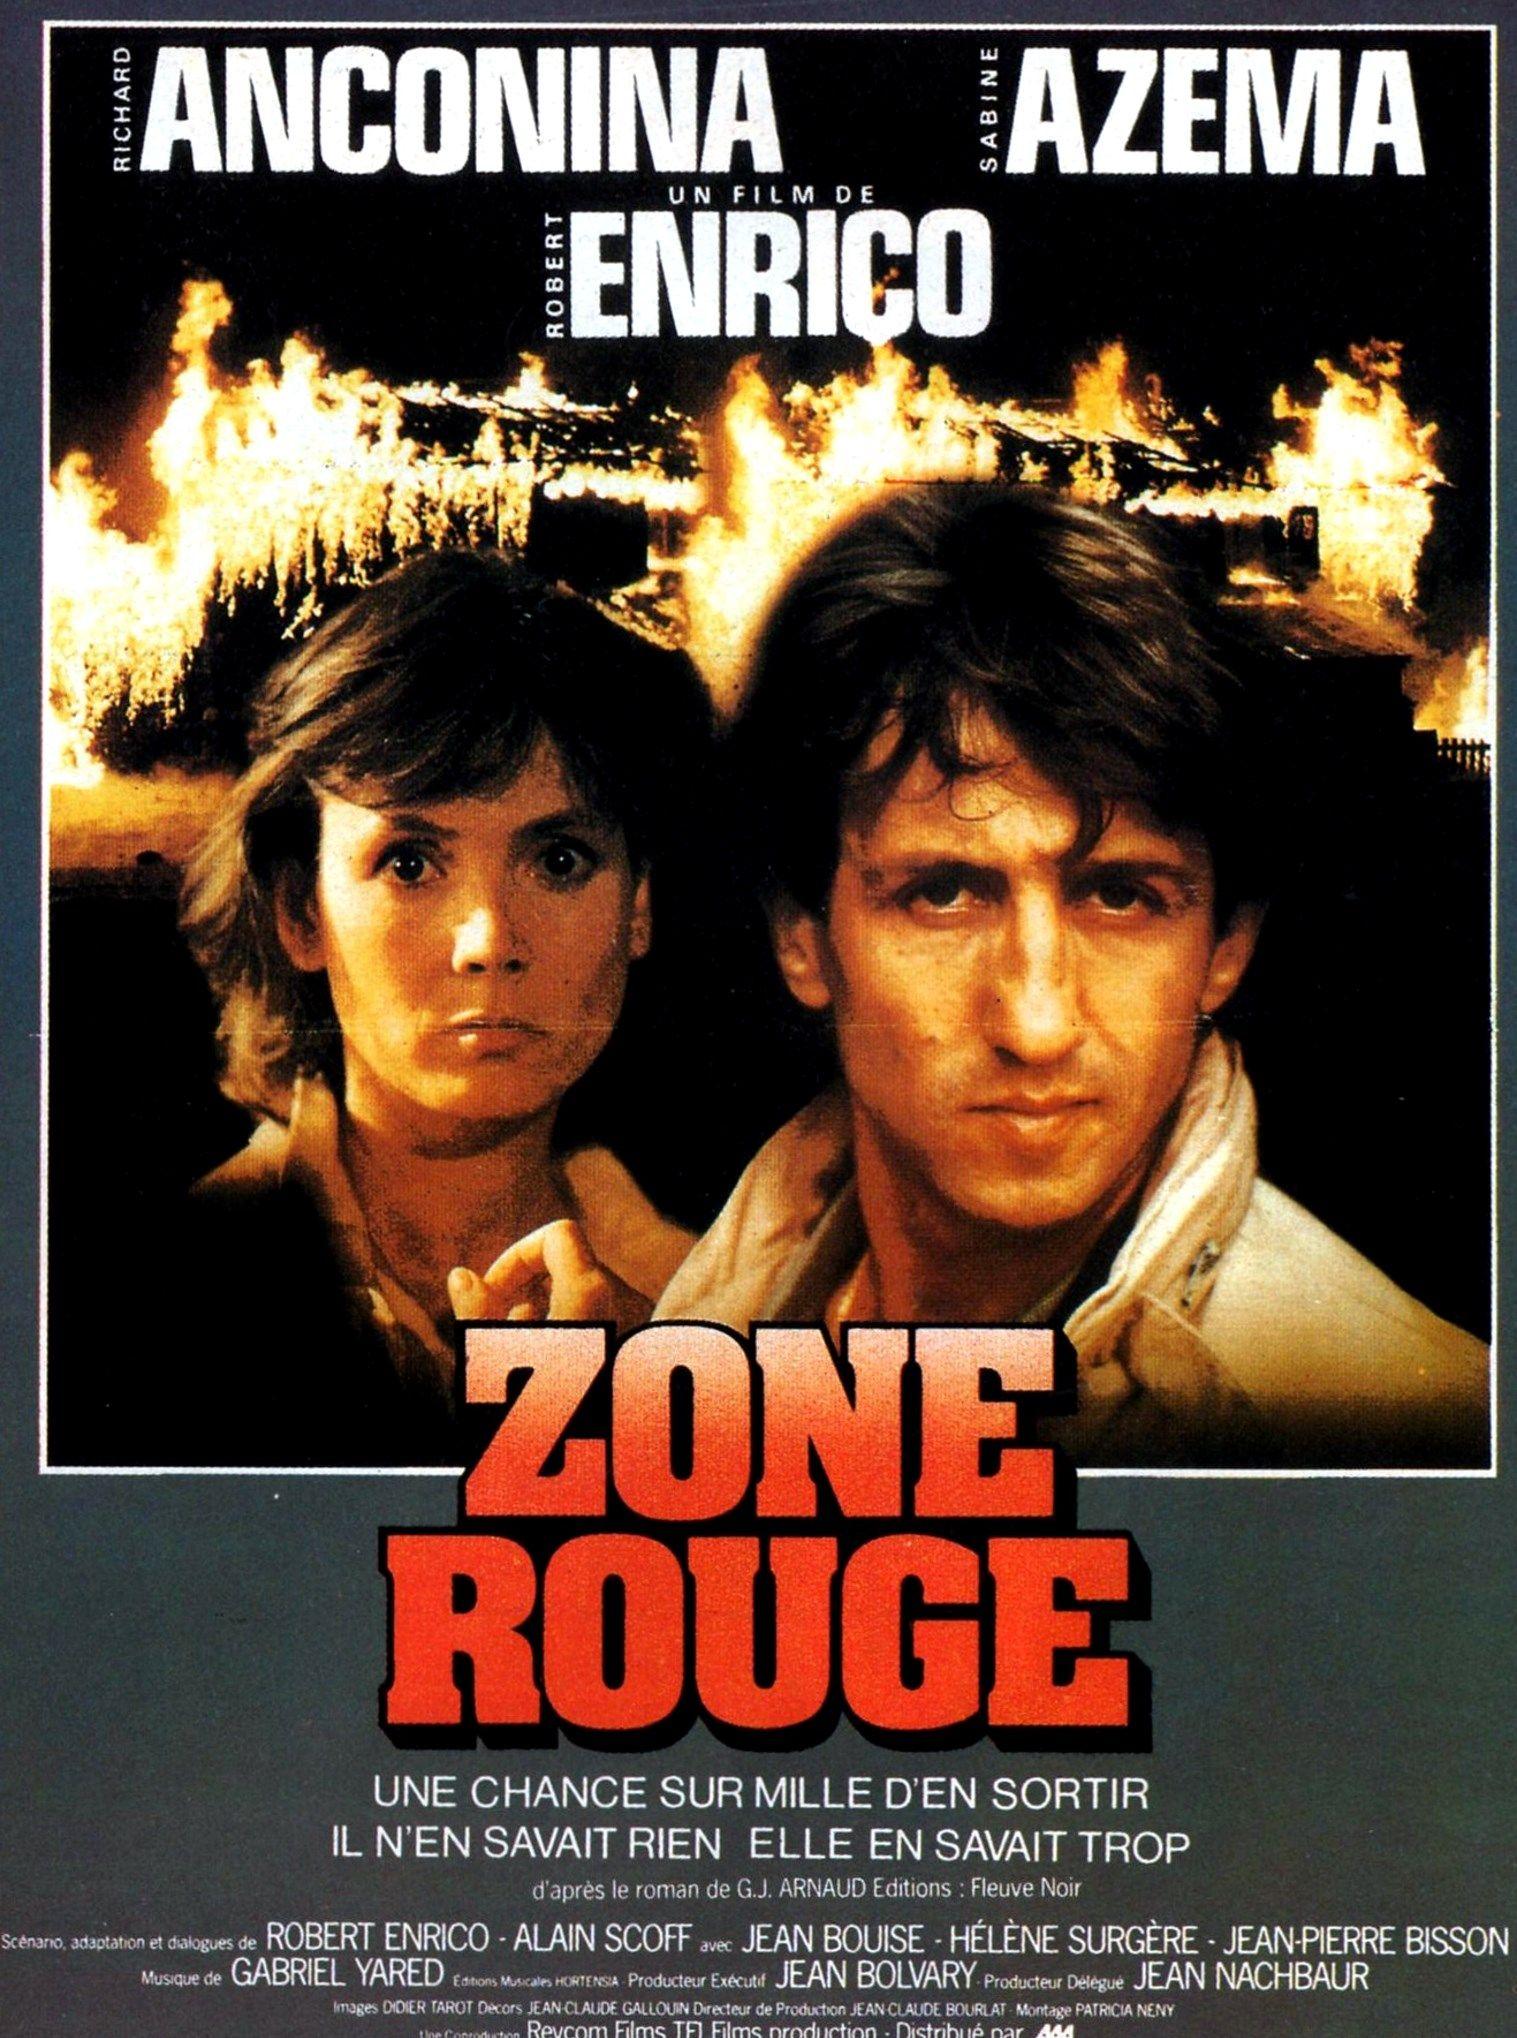 Le Rouge Et Le Noir Film Streaming : rouge, streaming, Rouge, Robert, Enrico, Sabine, Azema, Richard, Anconina, Артист